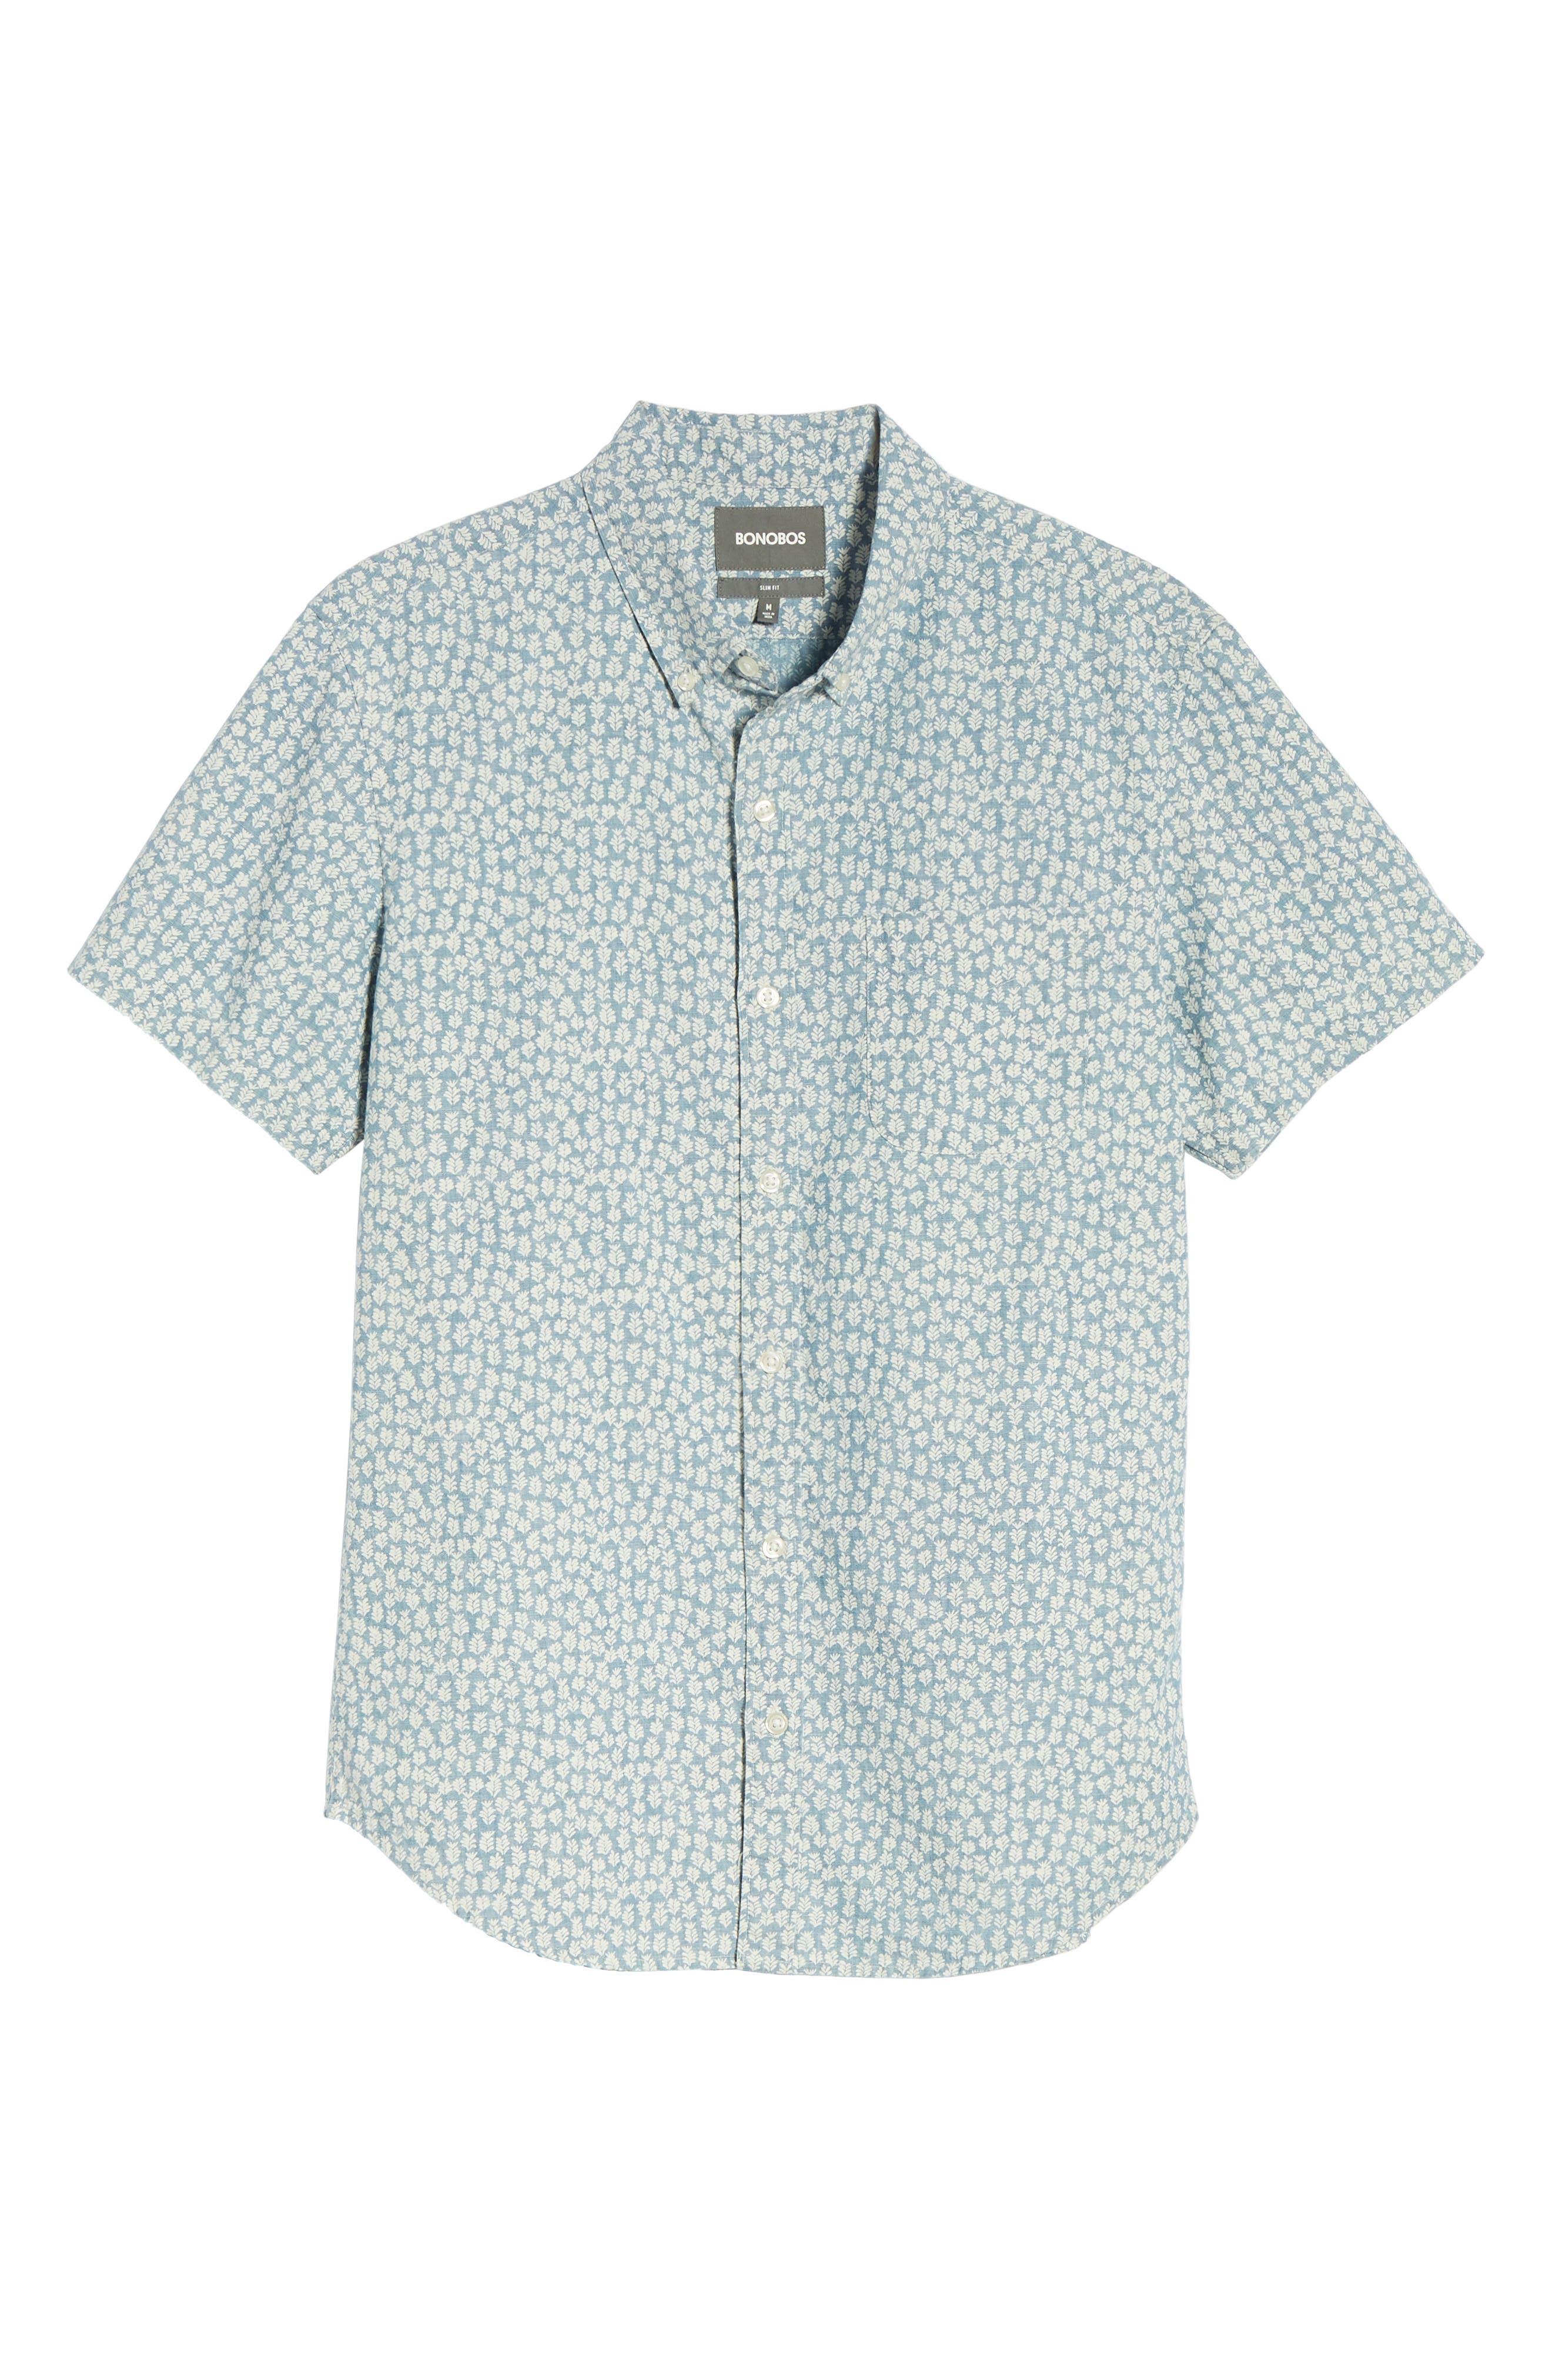 BONOBOS,                             Riviera Slim Fit Leaf Print Sport Shirt,                             Alternate thumbnail 6, color,                             400